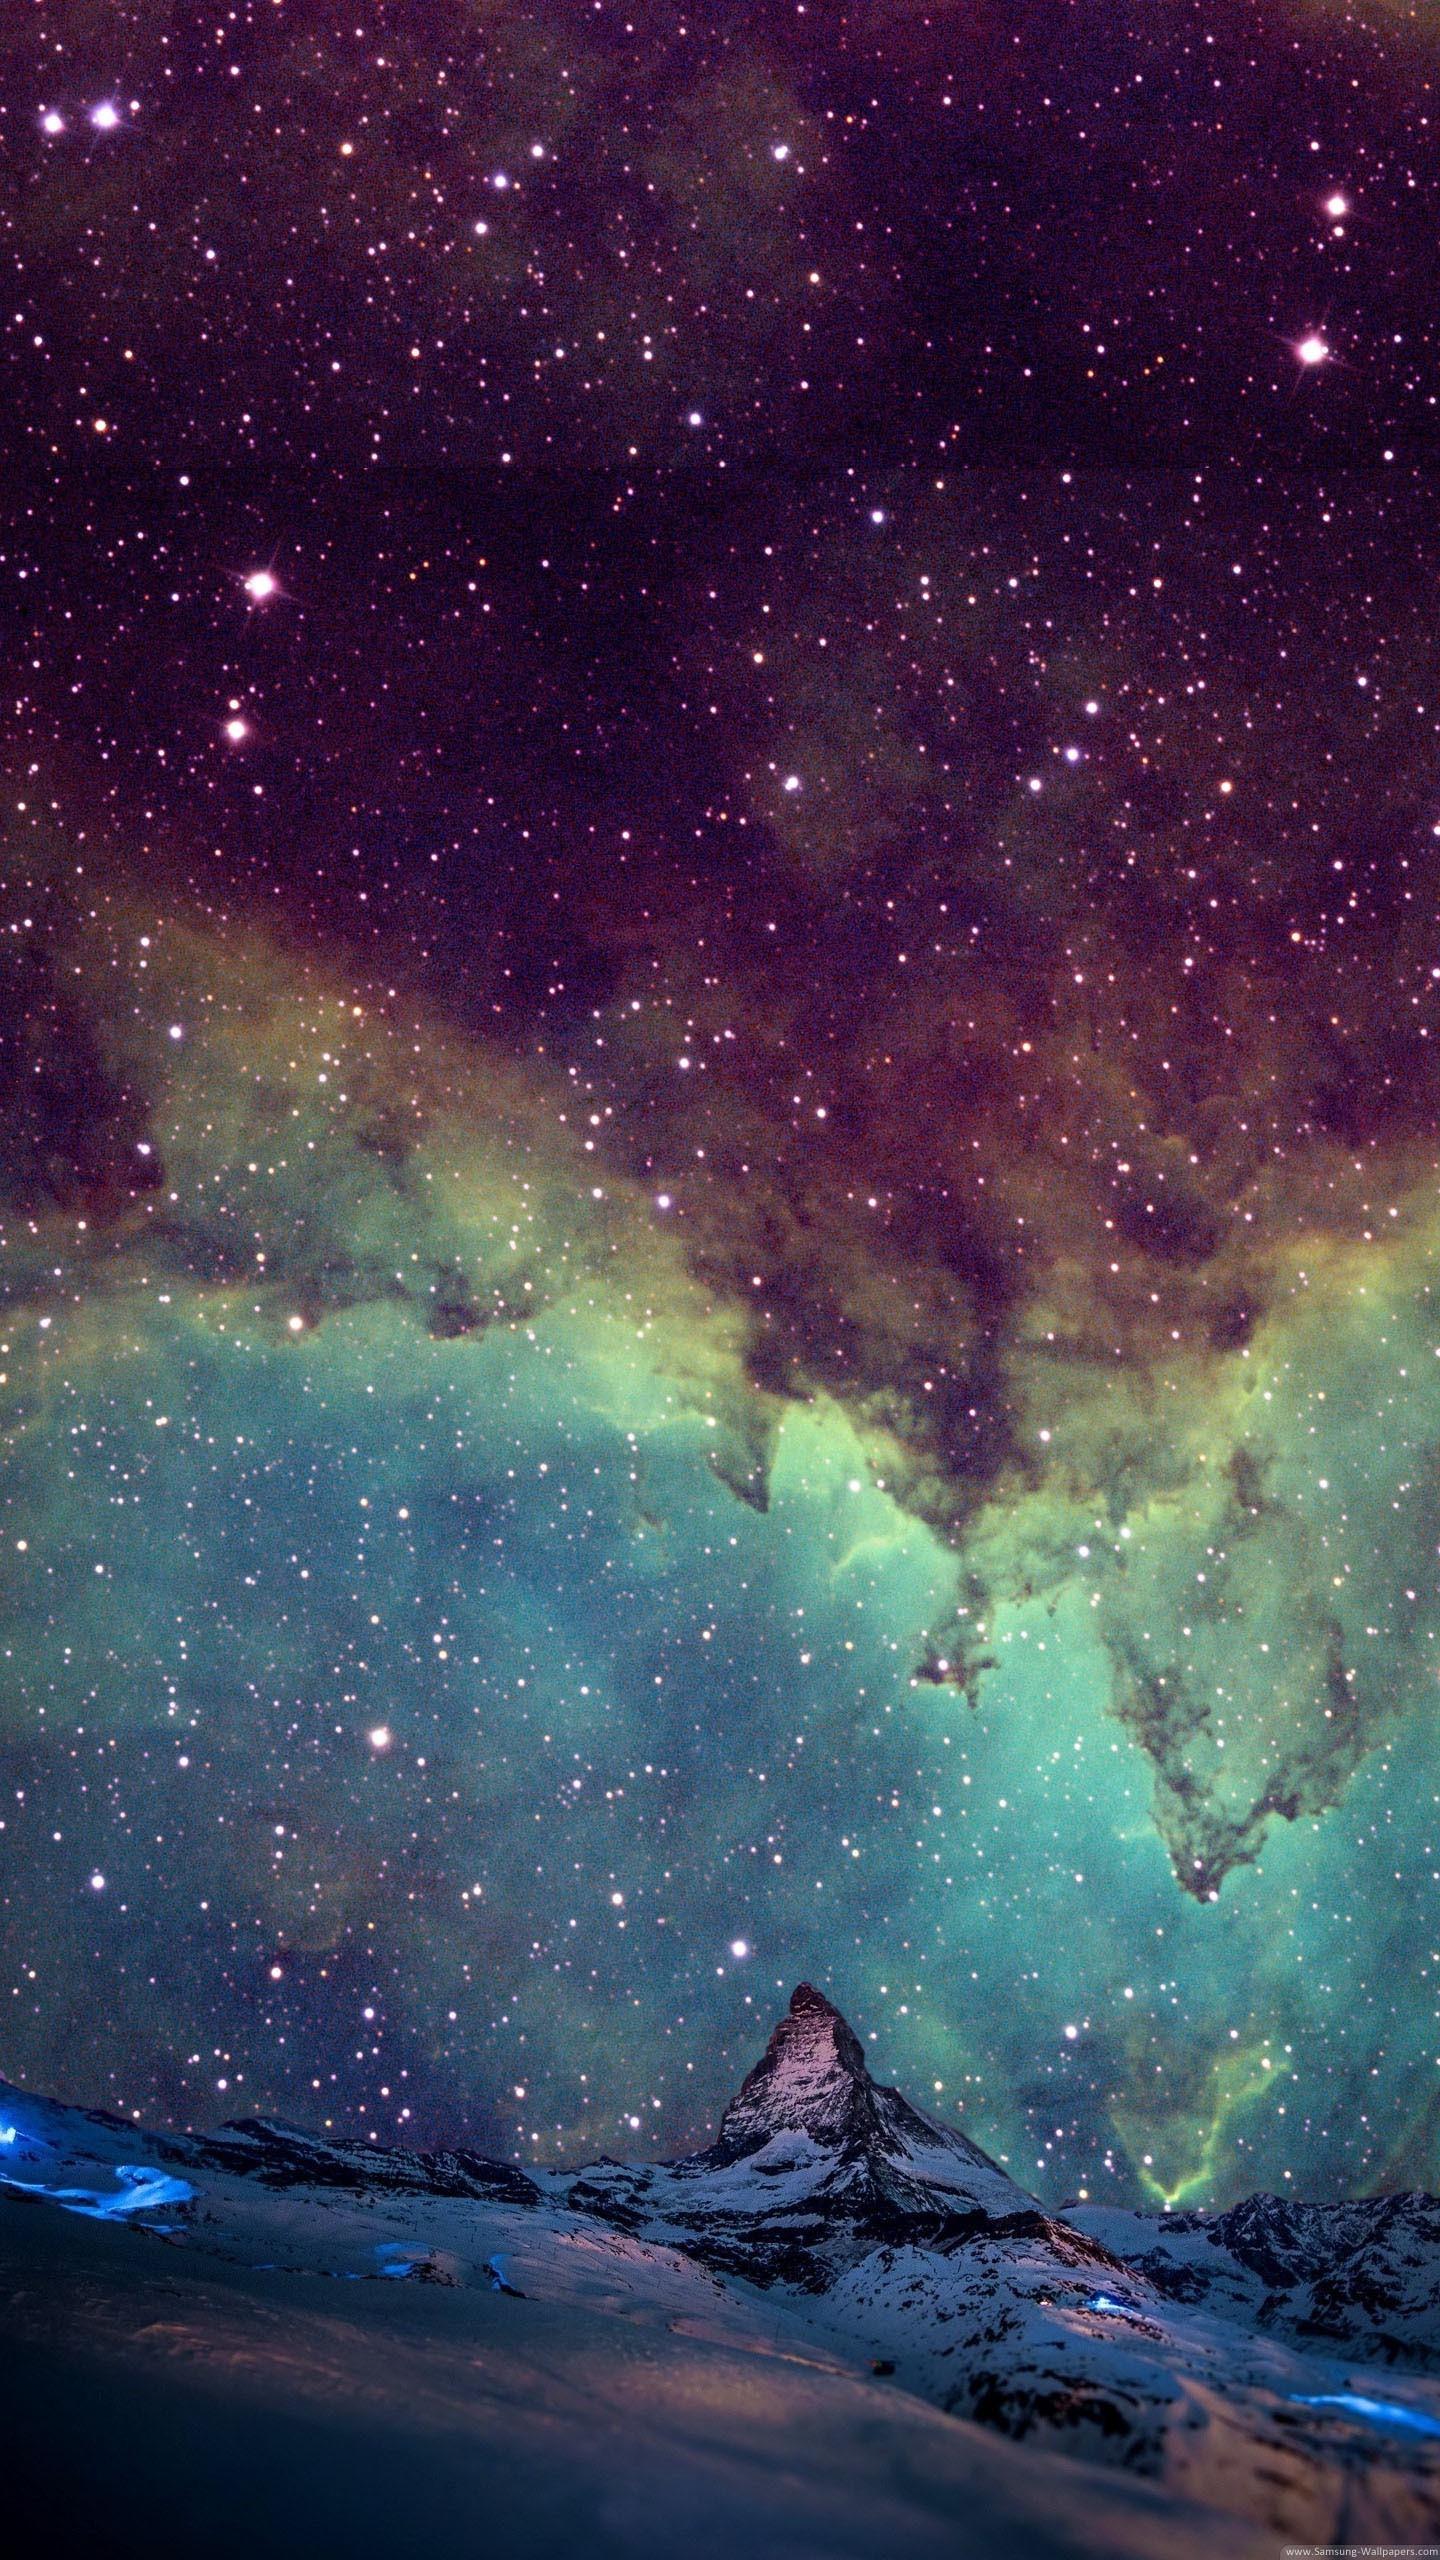 Free wallpaper for Galaxy wallpaper